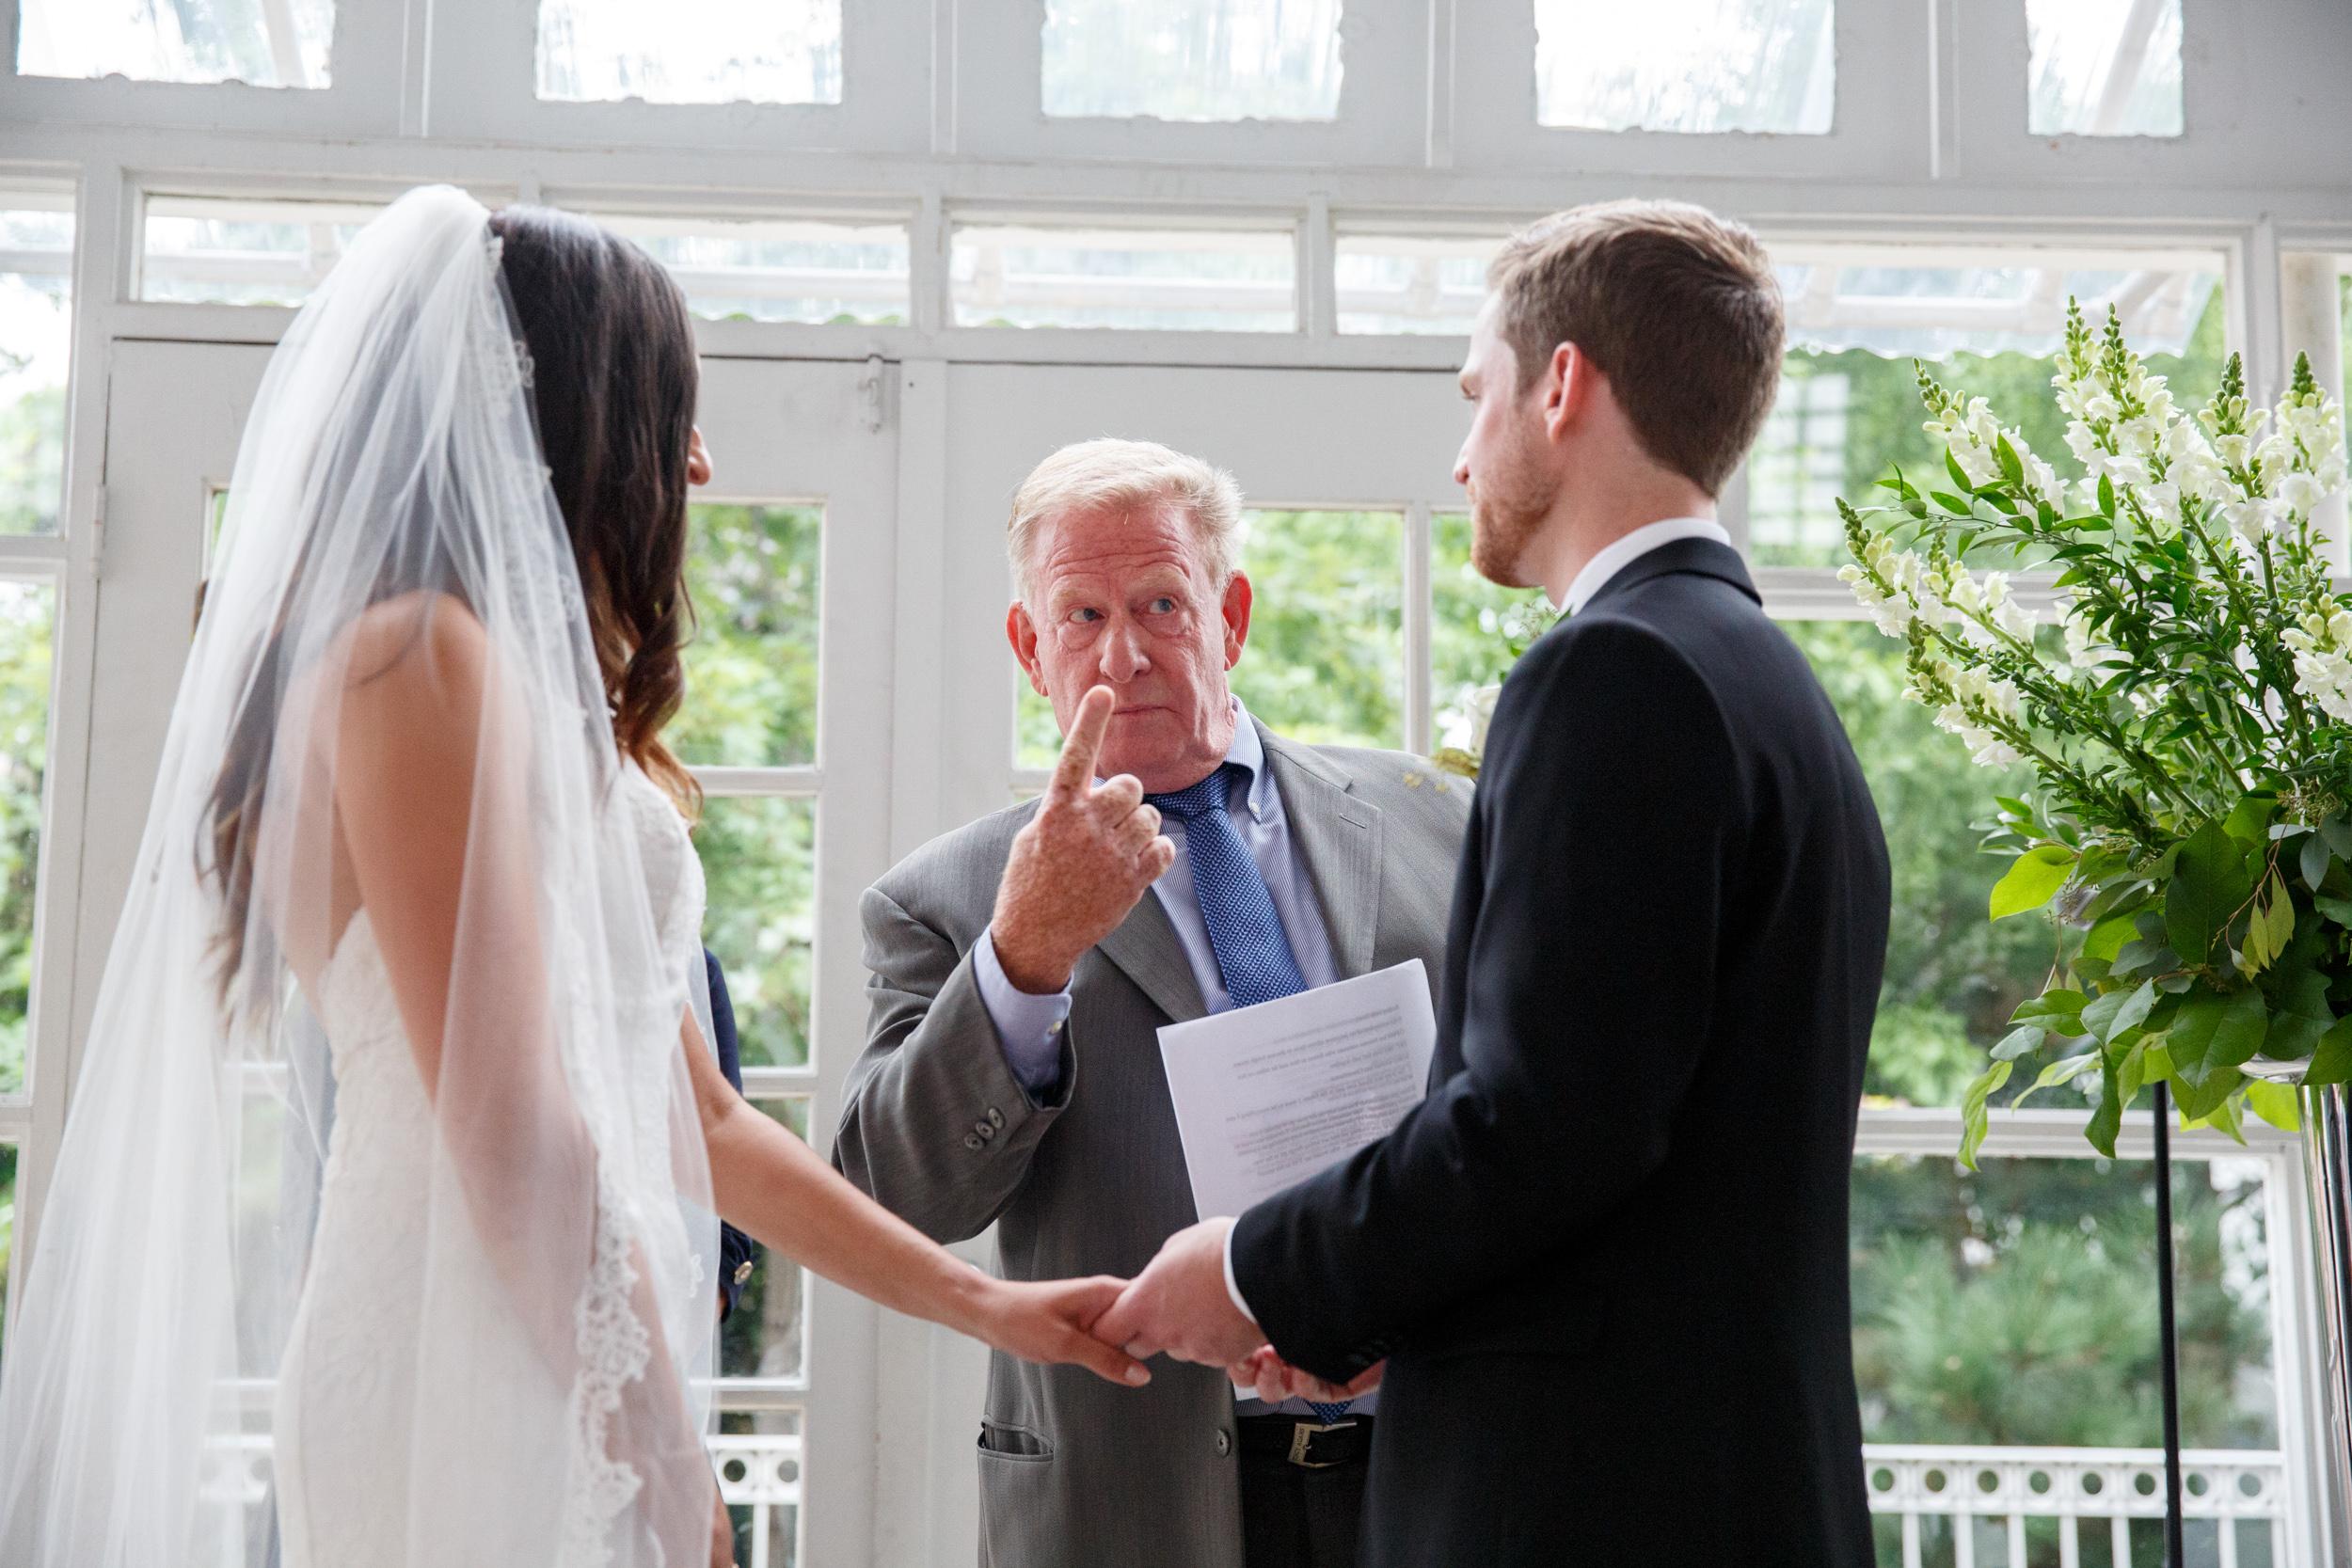 9-09-2016 Flora & Colin wedding photography by Brian Milo-154.jpg